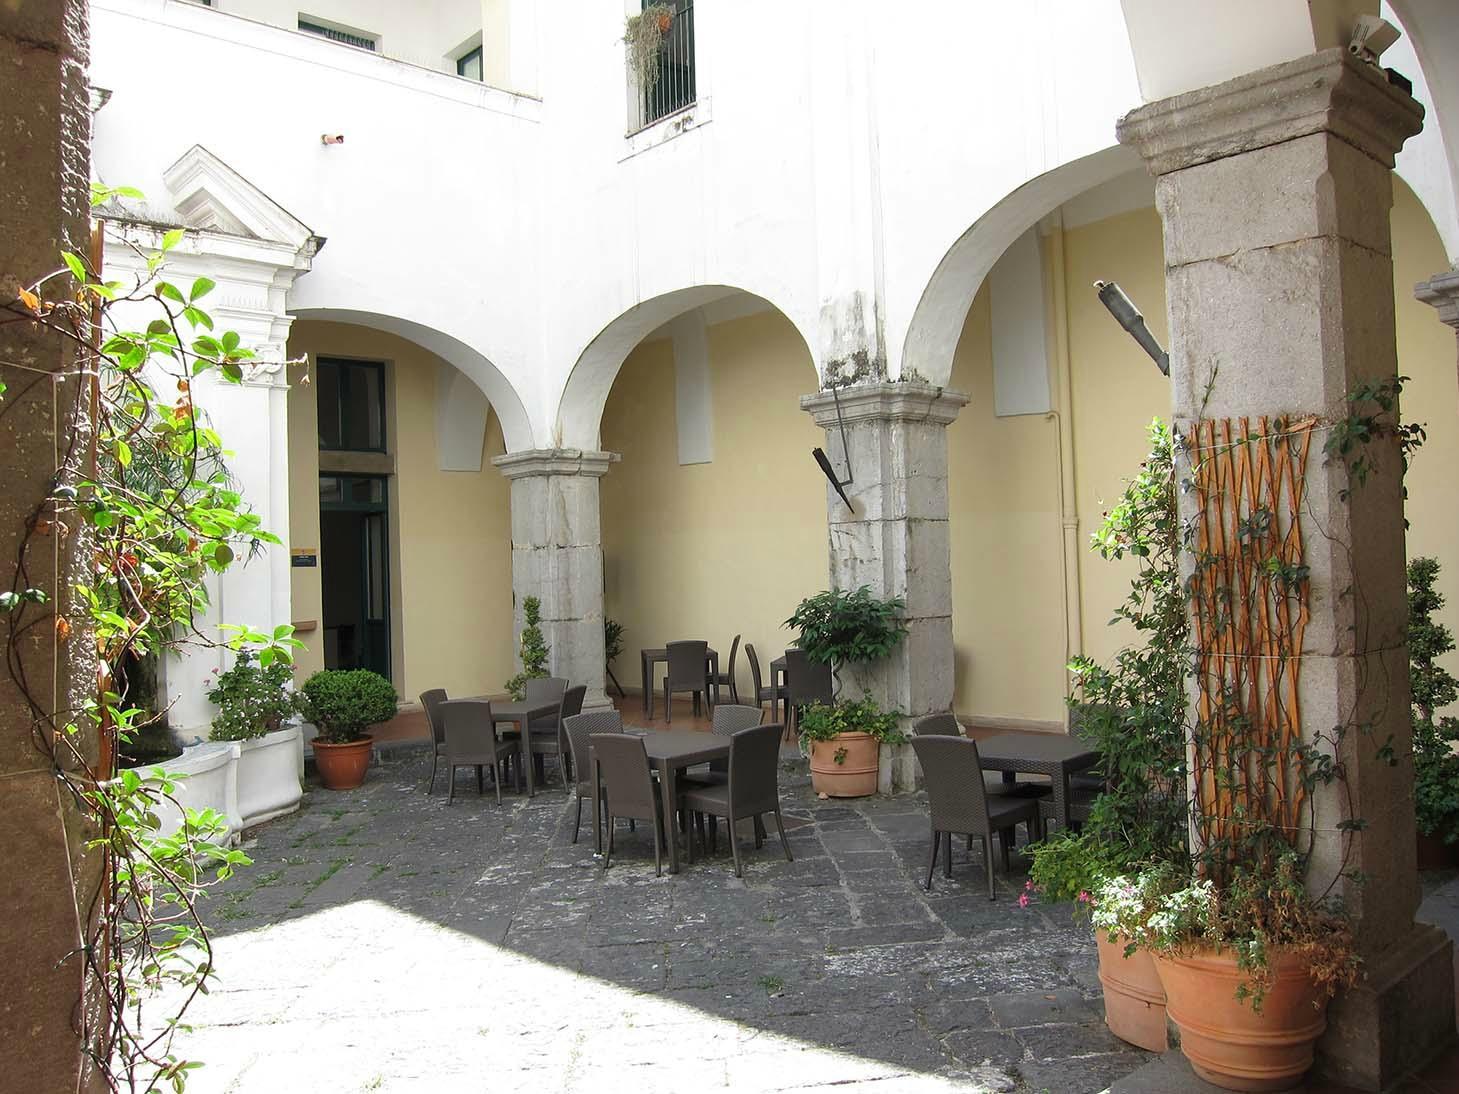 Hostel Salerno